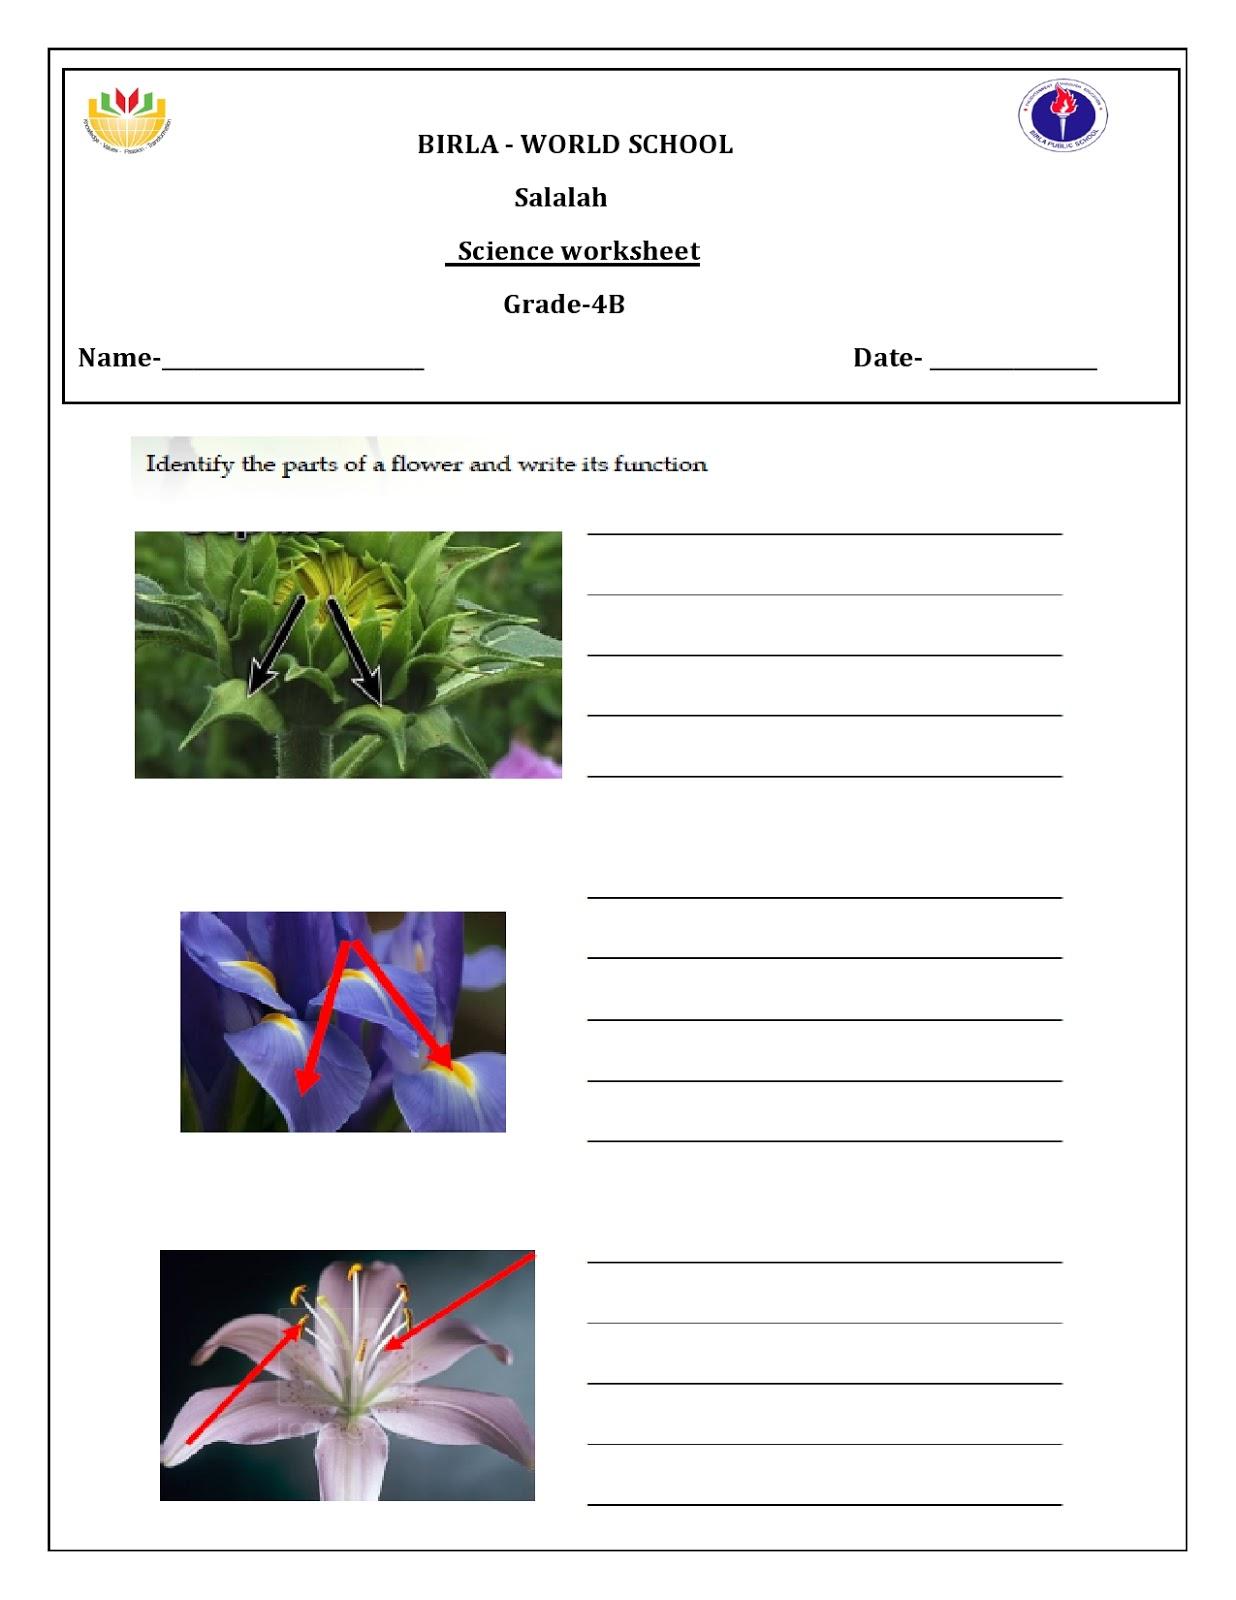 Birla World School Oman Homework For Grade 4 B On 01 12 16